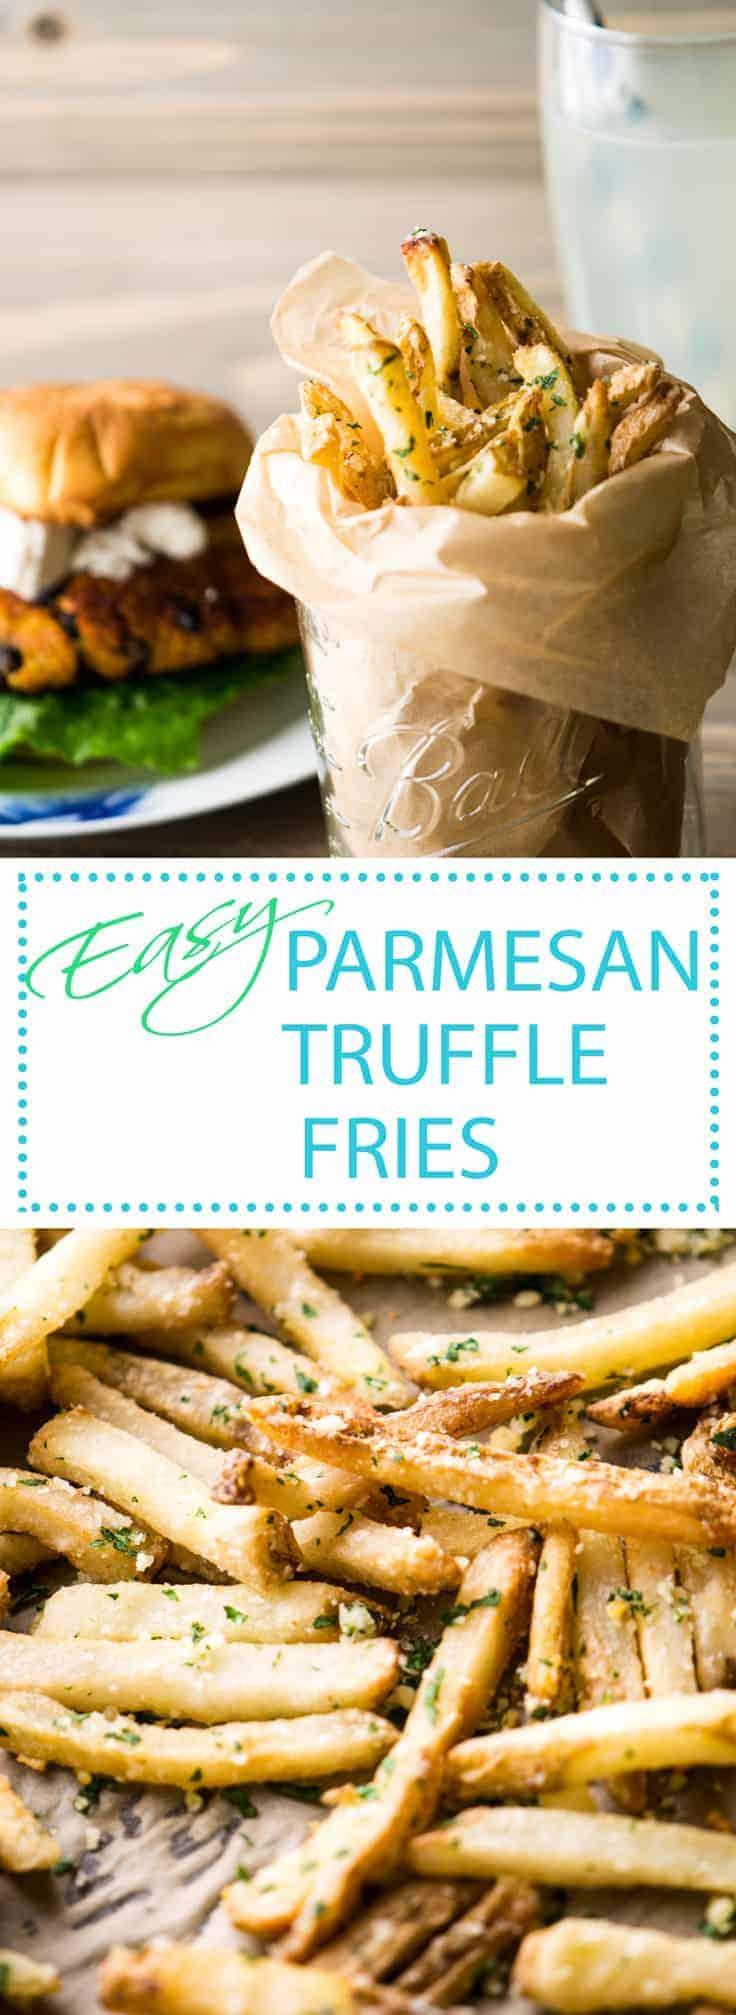 Parmesan Truffle Fries